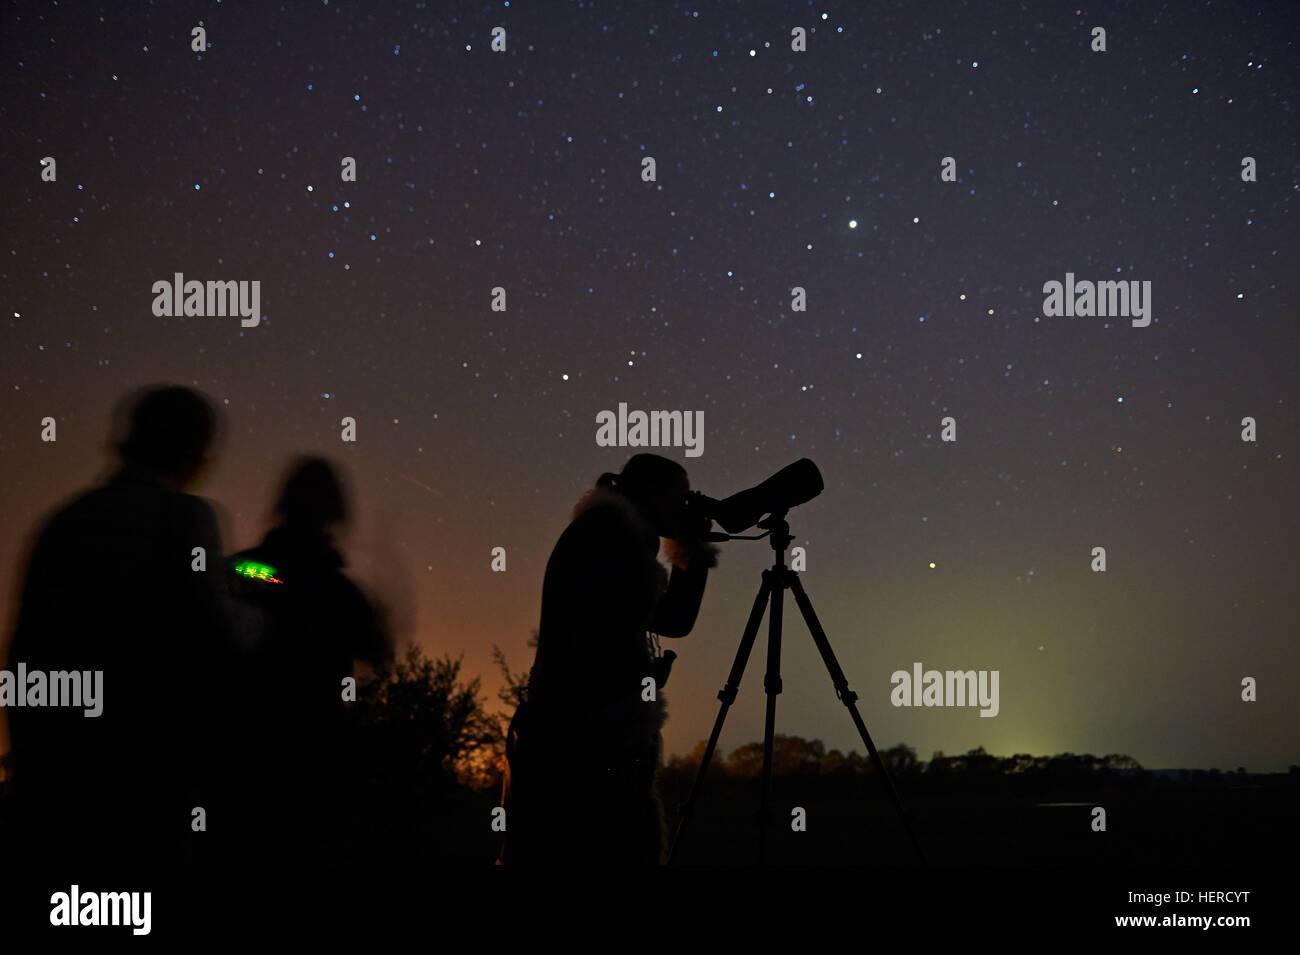 Brandeburgo, Gülpe, Personen beobachten Sternenhimmel, AM 12. Februar wurde dem Westhavelland Naturpark Immagini Stock